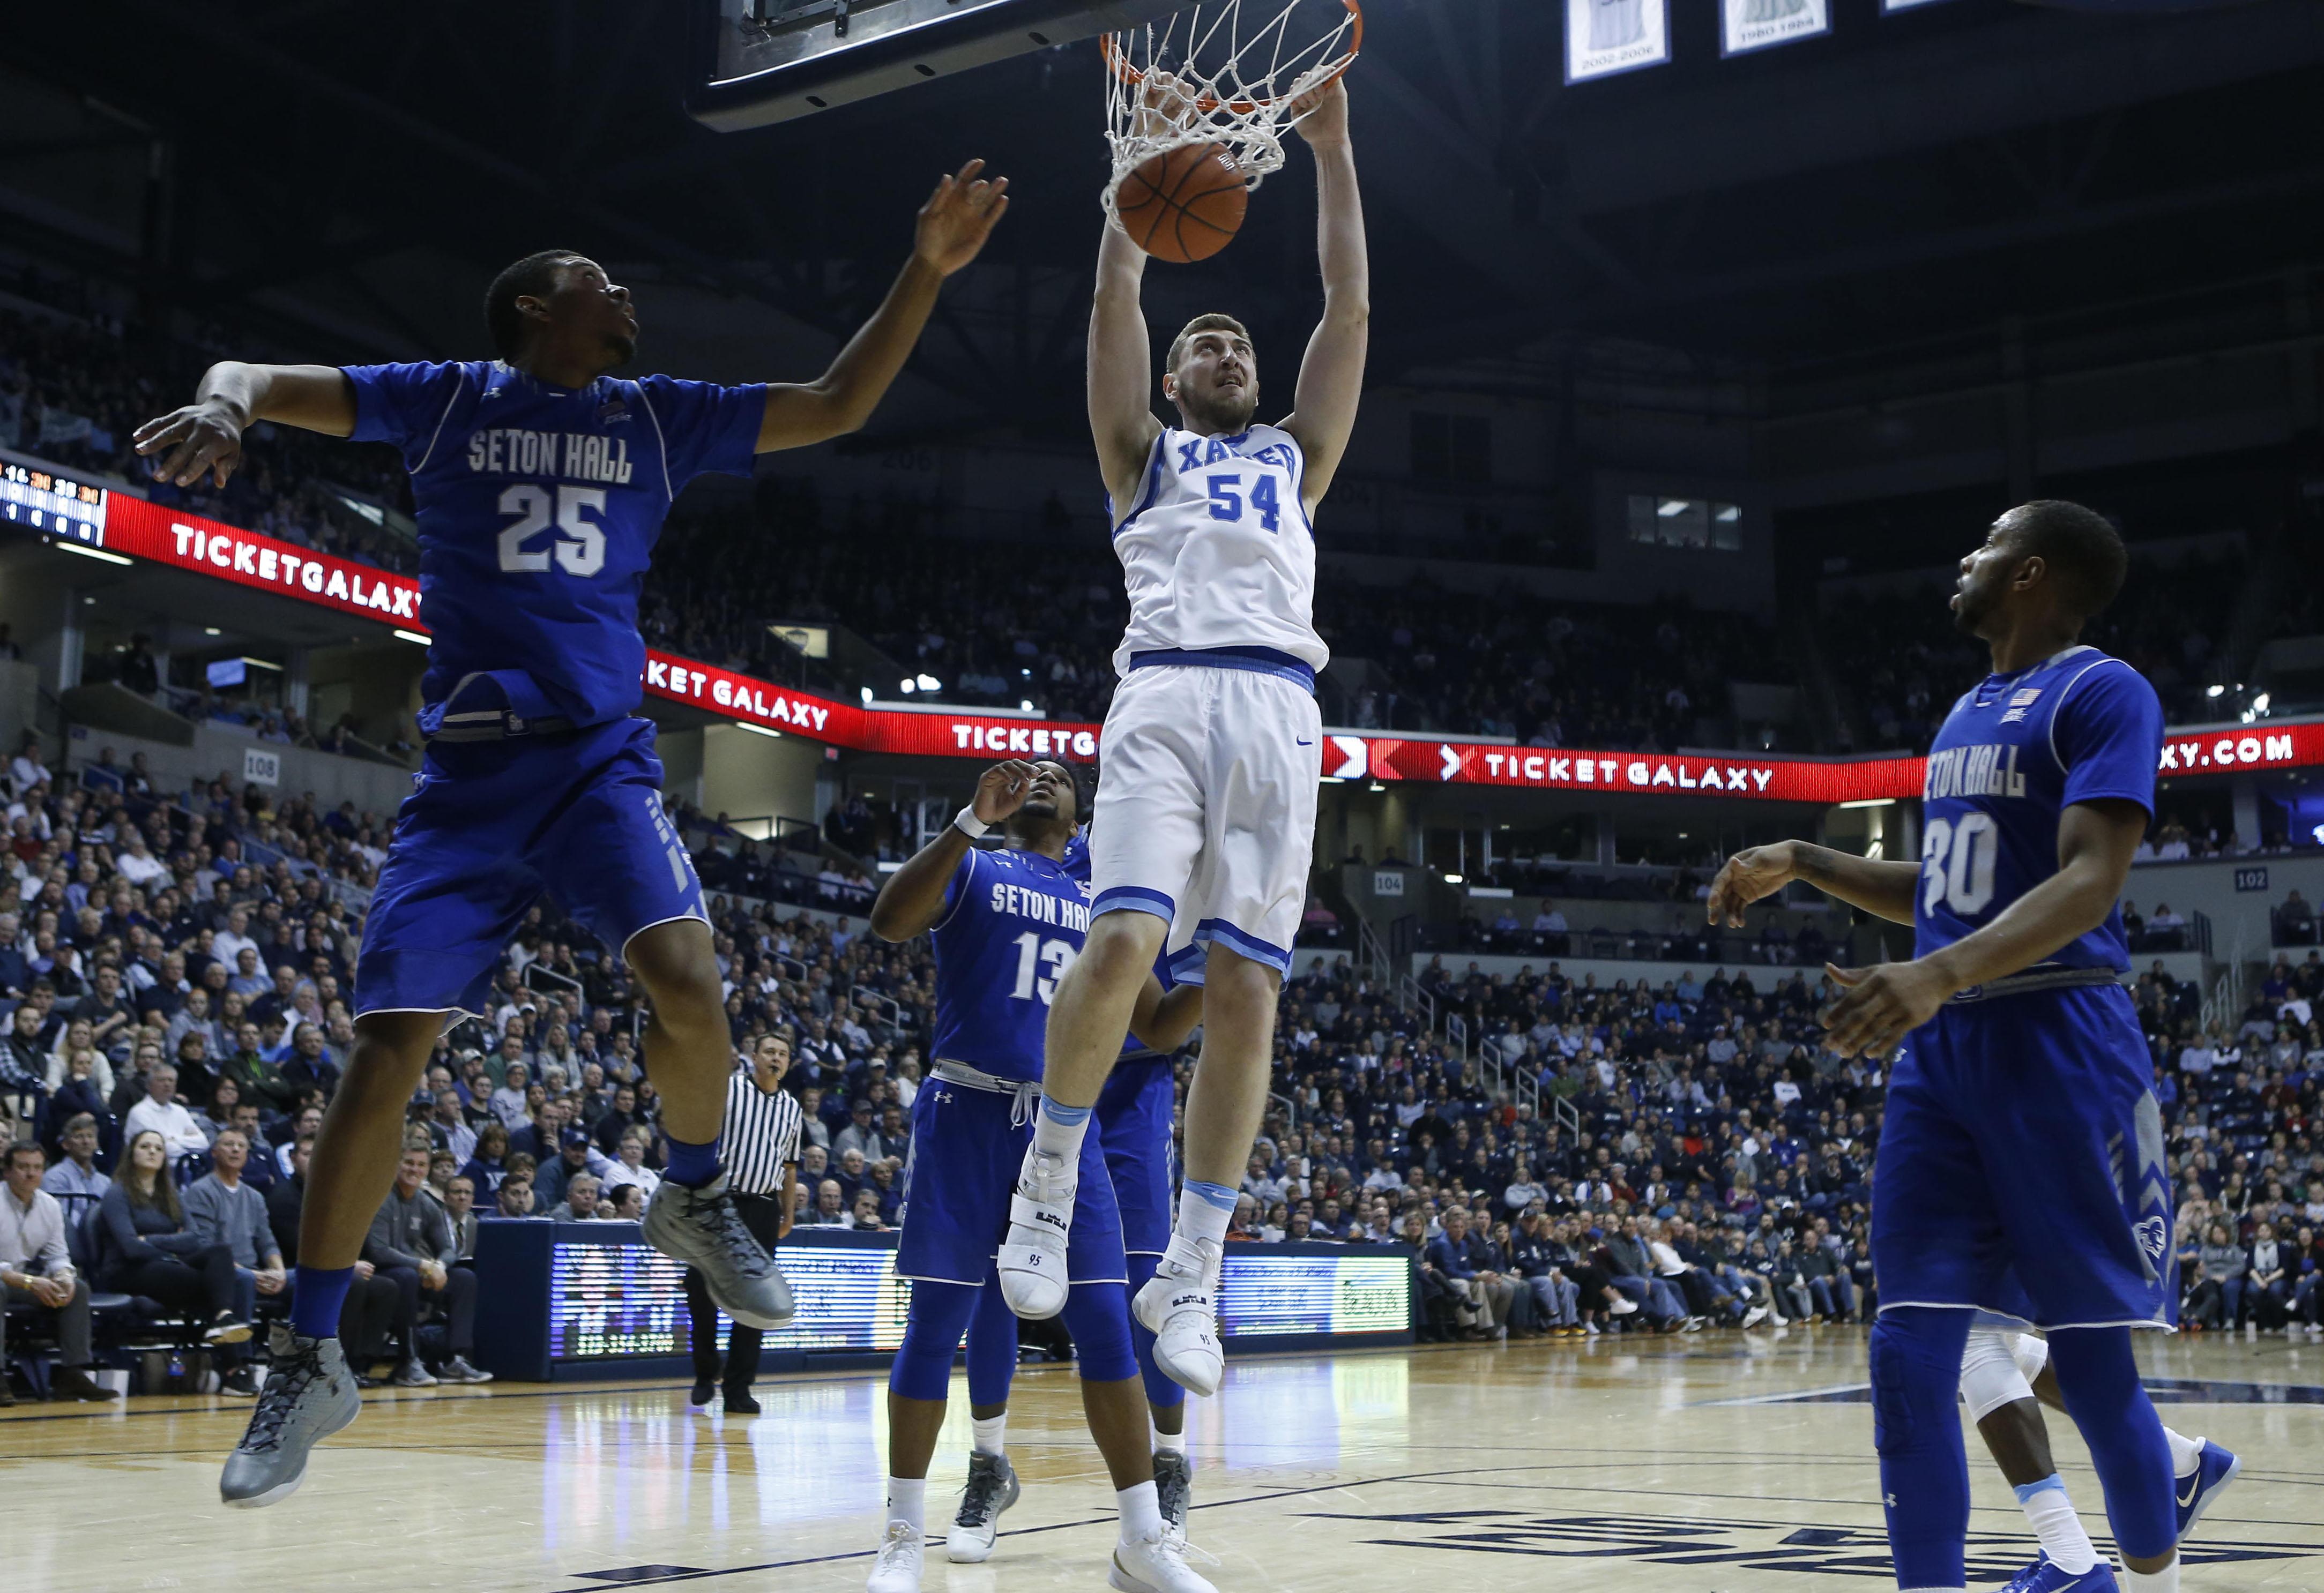 Creighton Providence Basketball Score | Basketball Scores